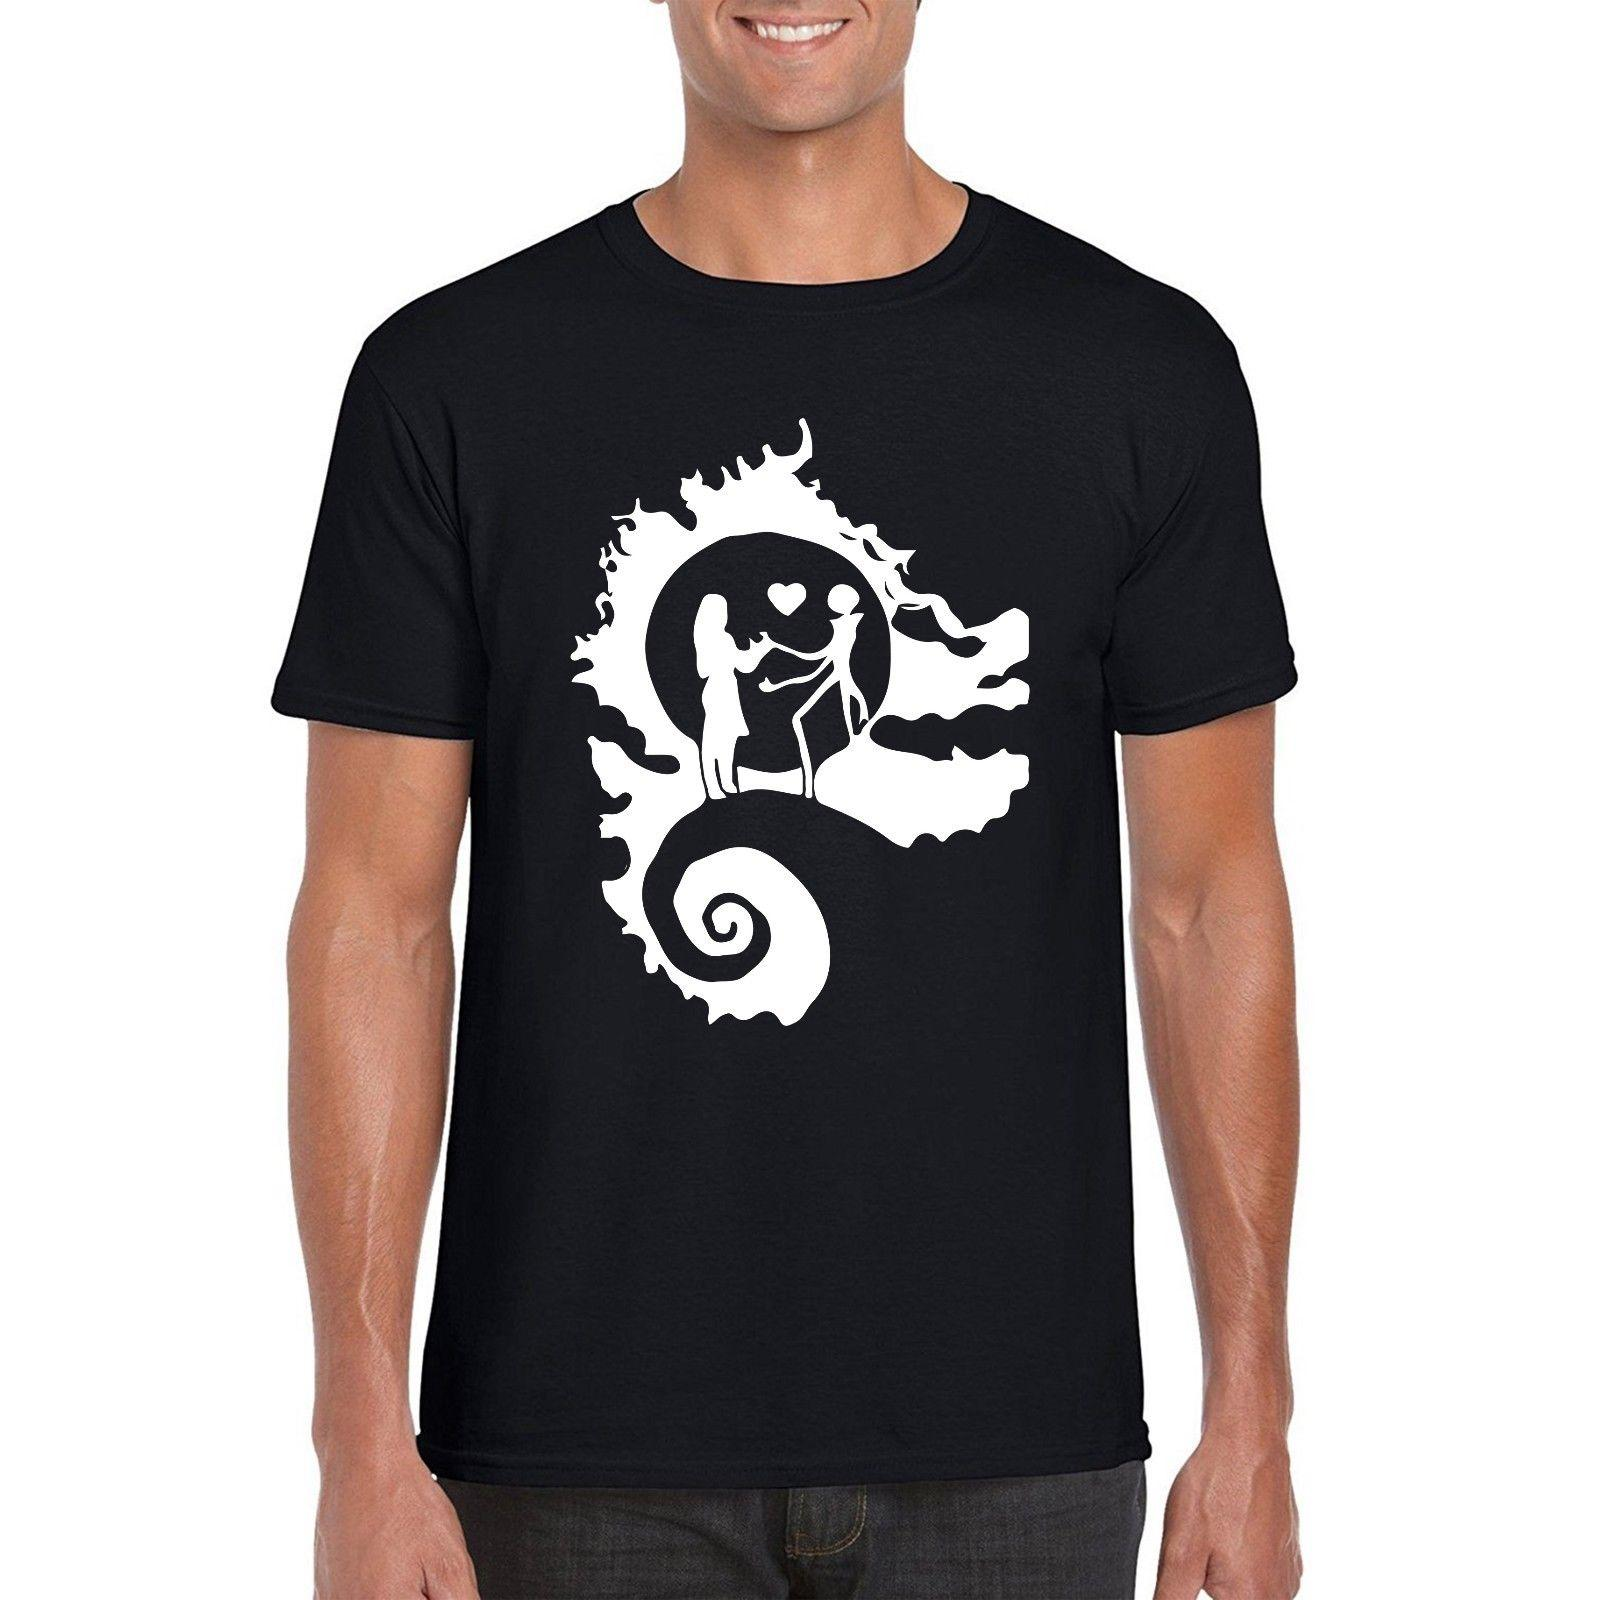 Jack Skellington T Shirt, Nightmare Before Christmas Inspired Parody ...